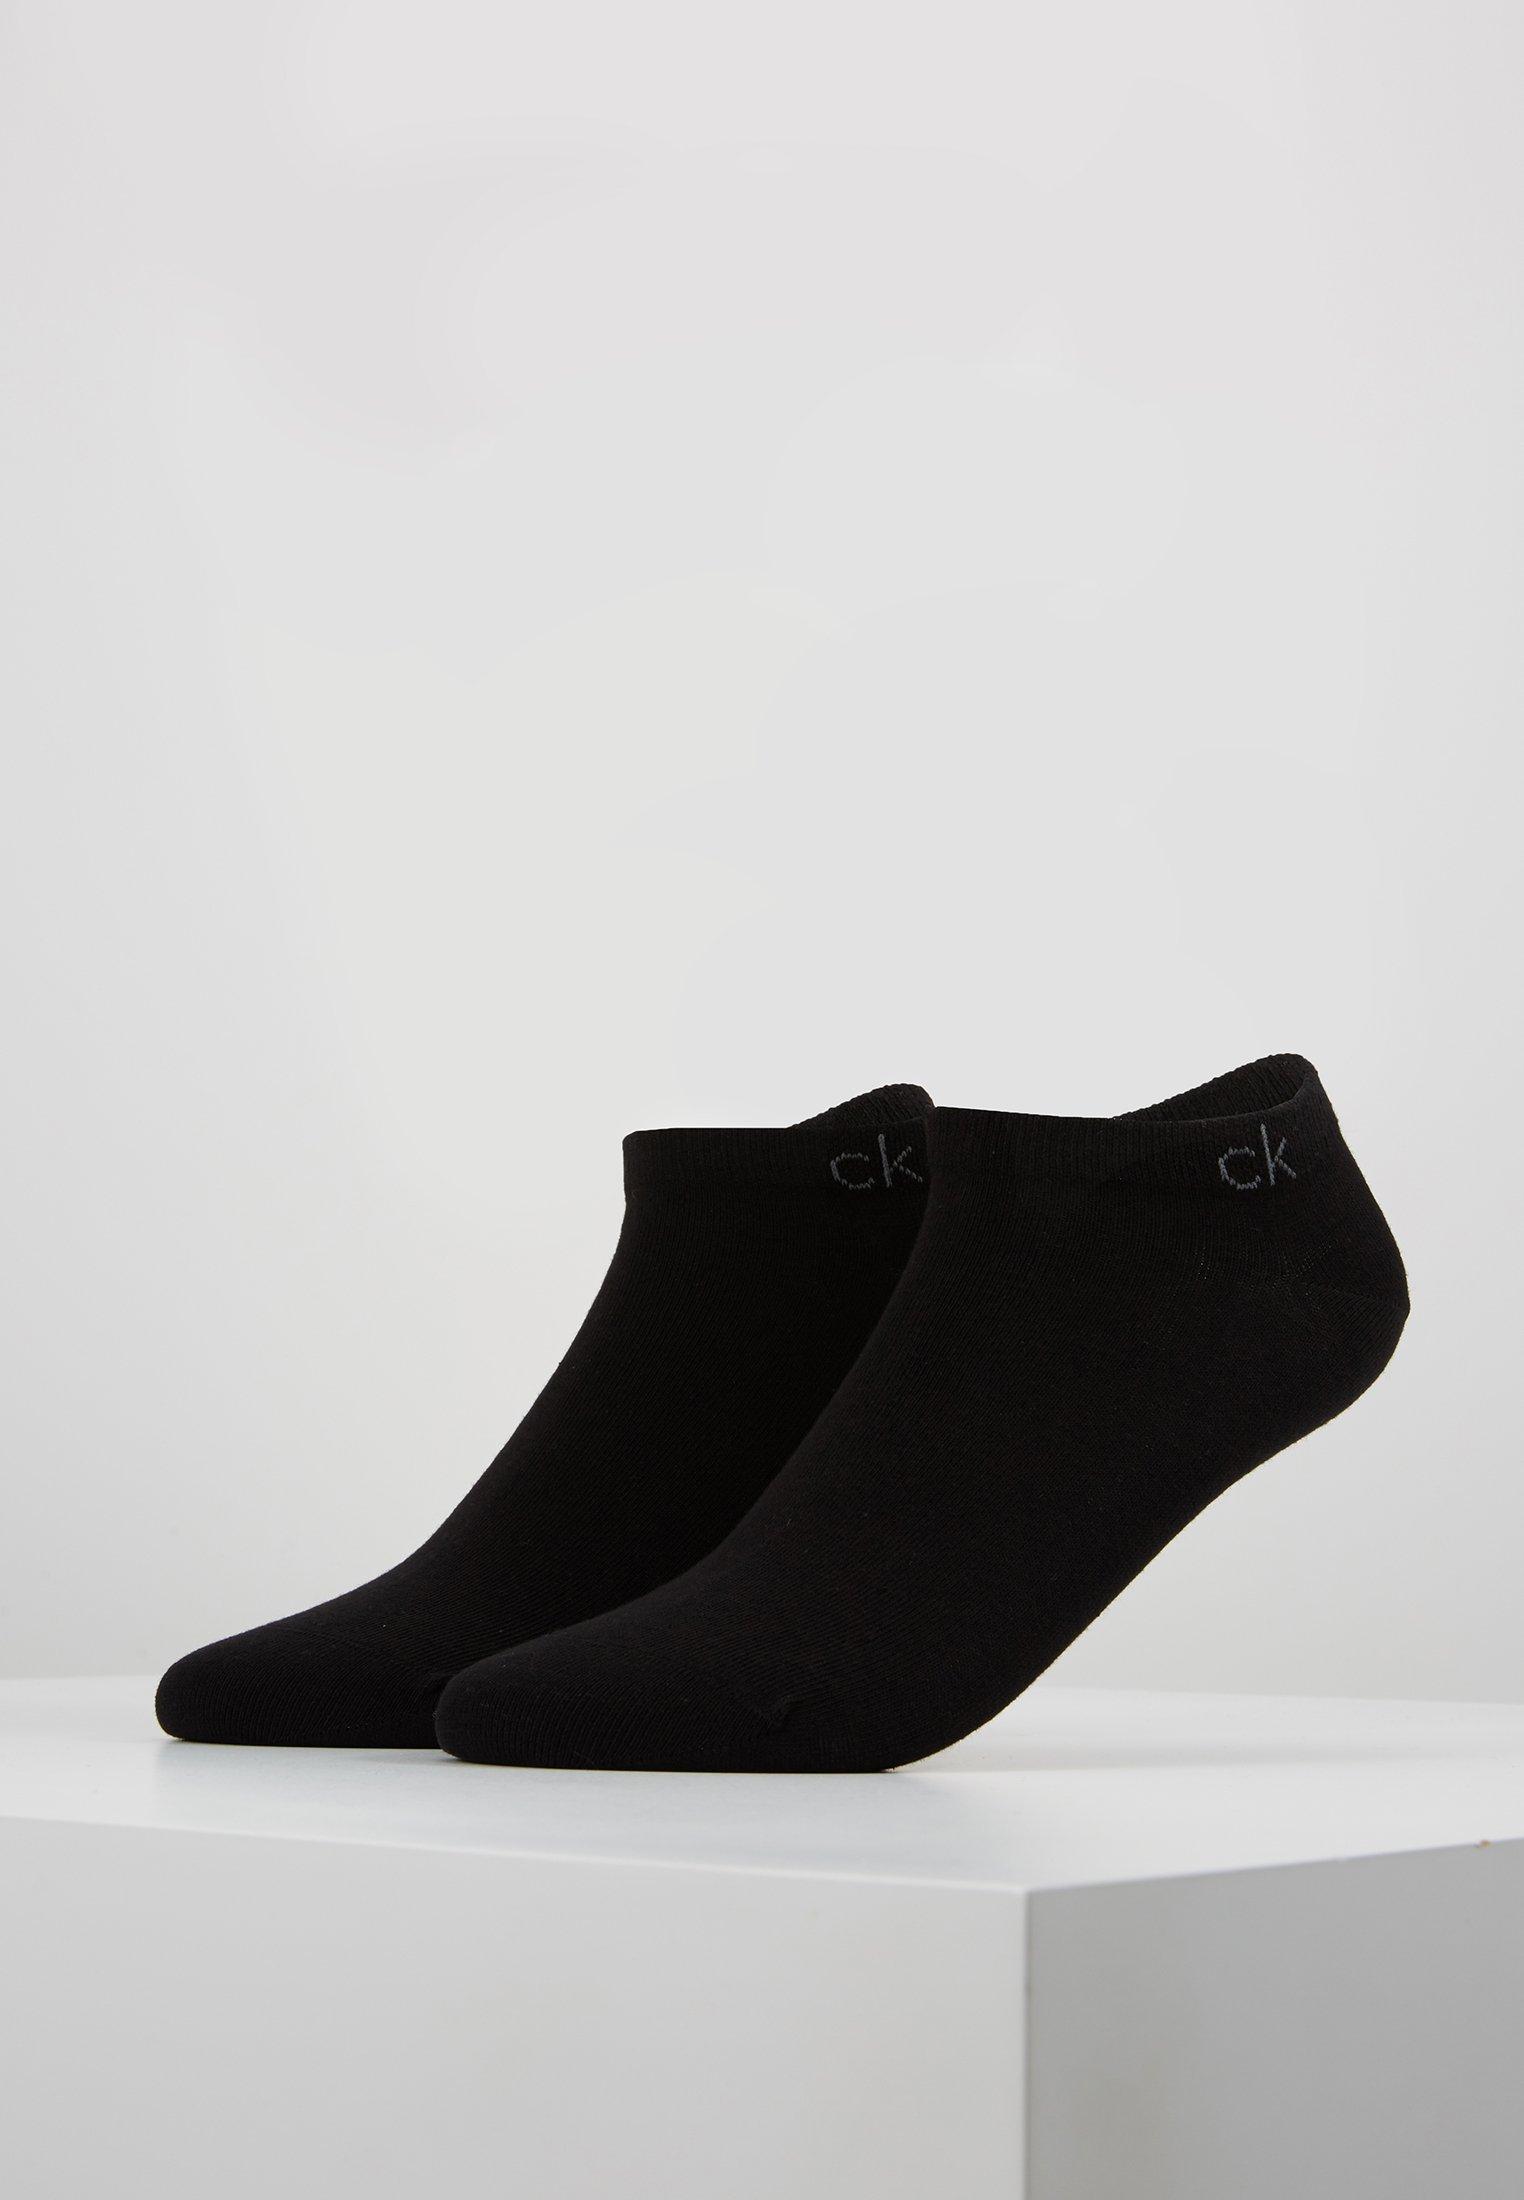 Femme FLAT 2 PACK - Chaussettes